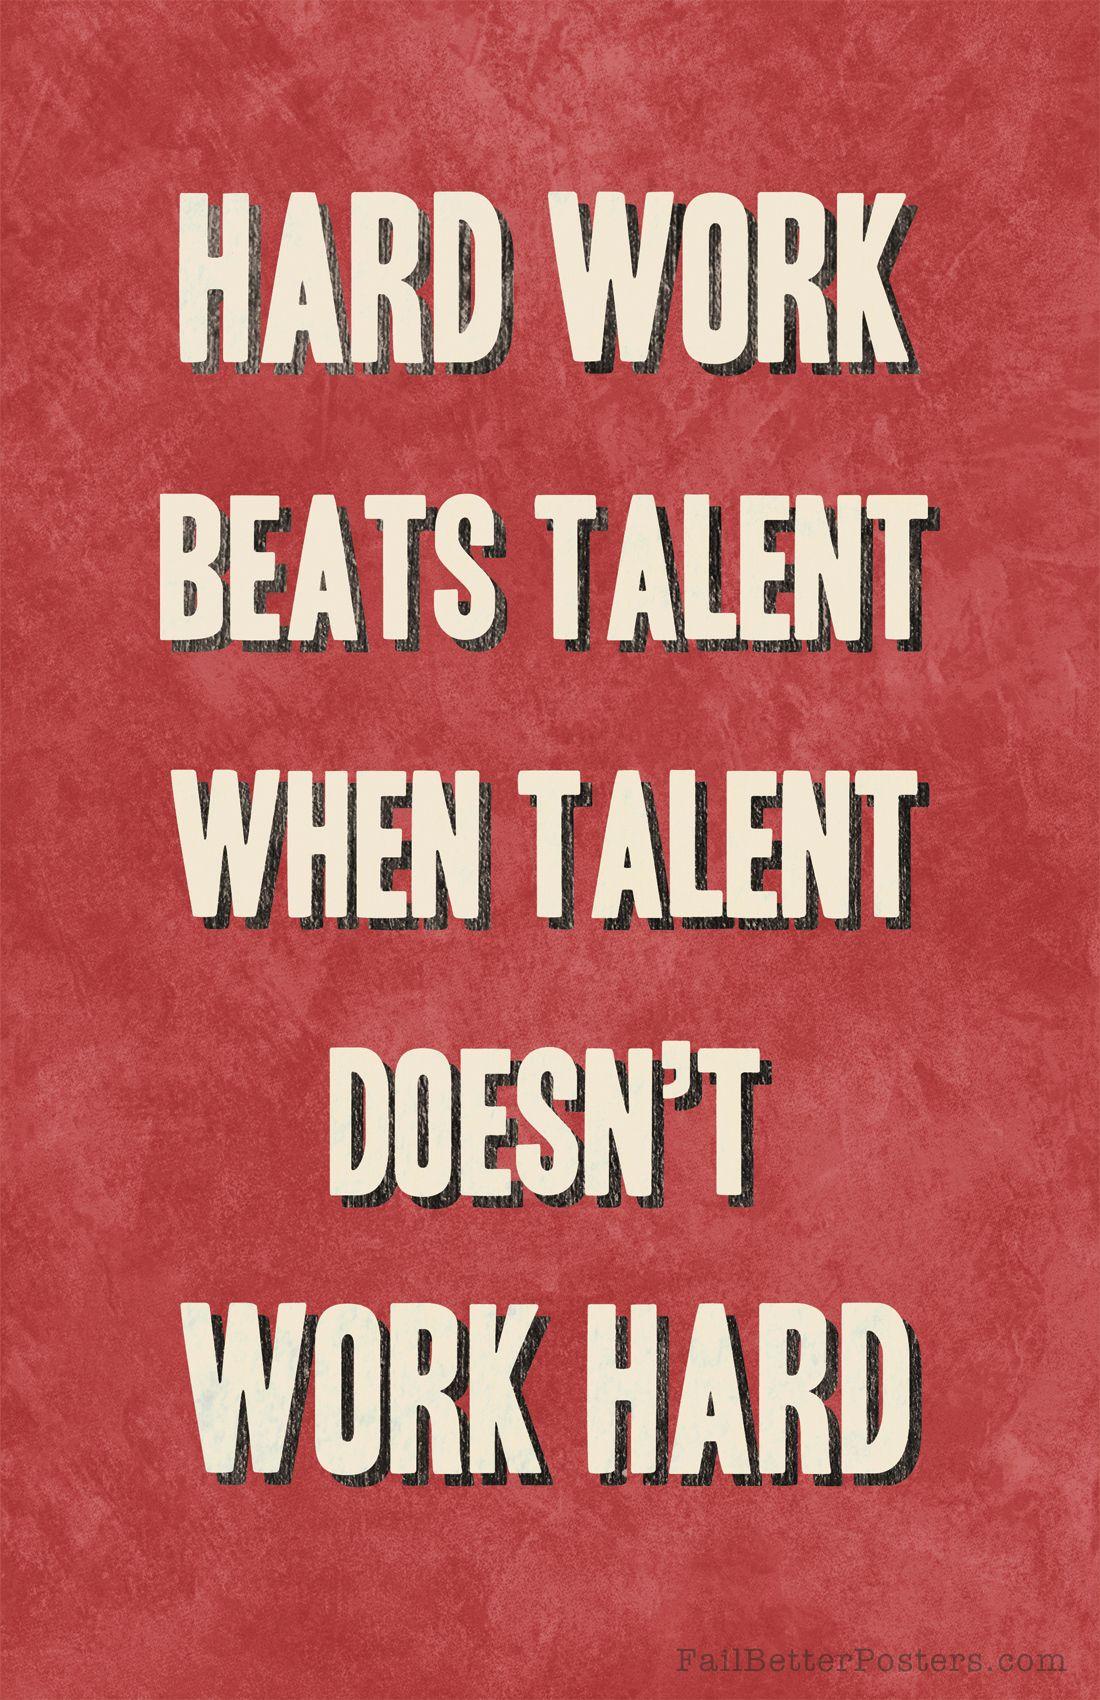 "Hard Work Beats Talent Quote Hard Work Beats Talent When Talent Doesn't Work Hard.""  Kevin ."